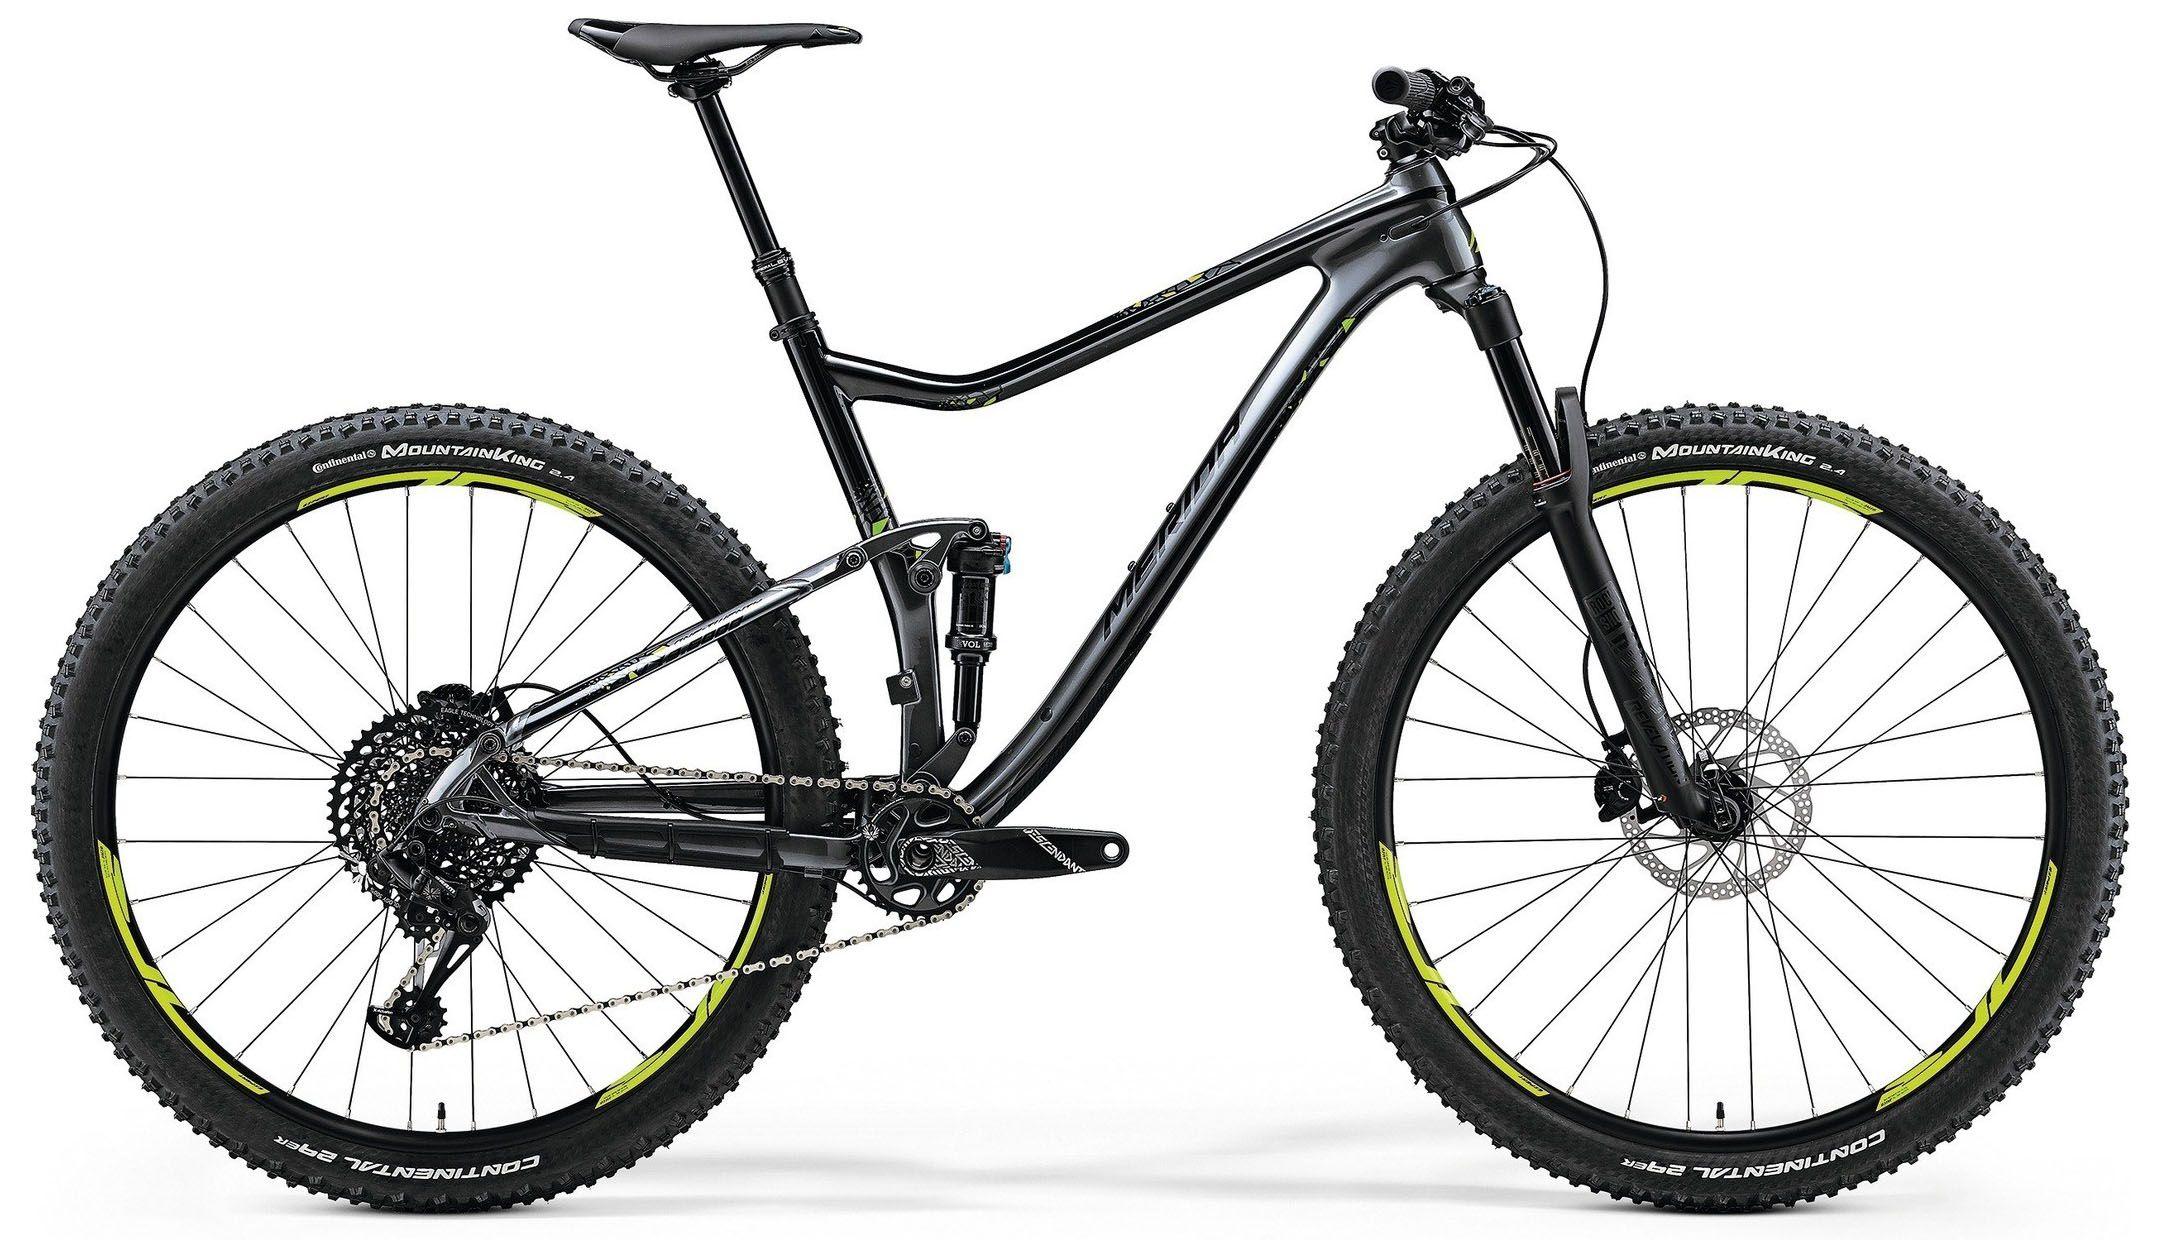 Велосипед Merida One-Twenty 9.6000 2018,  Двухподвесы  - артикул:288006